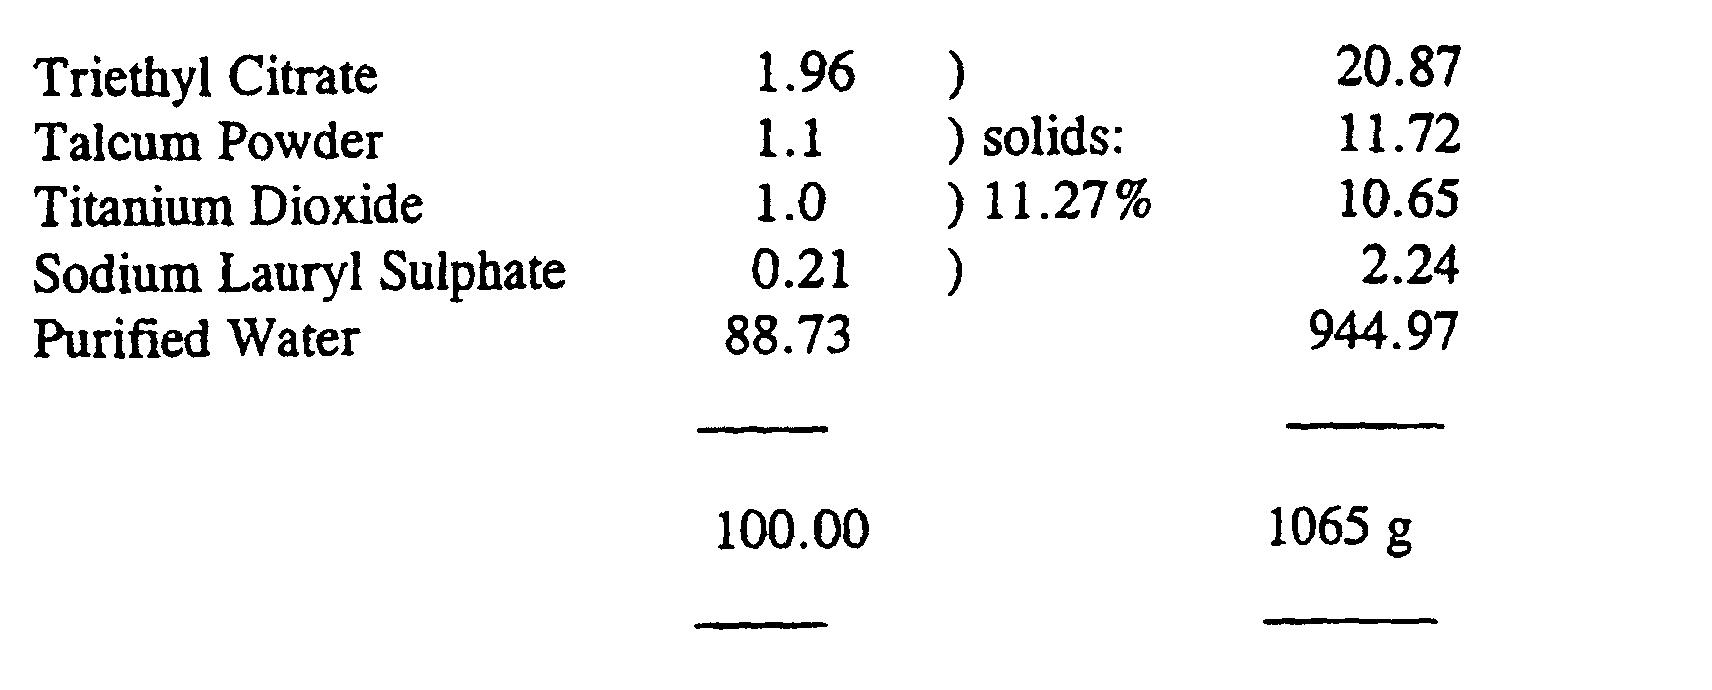 EP1128826B1 - Chromone enteric release formulation - Google